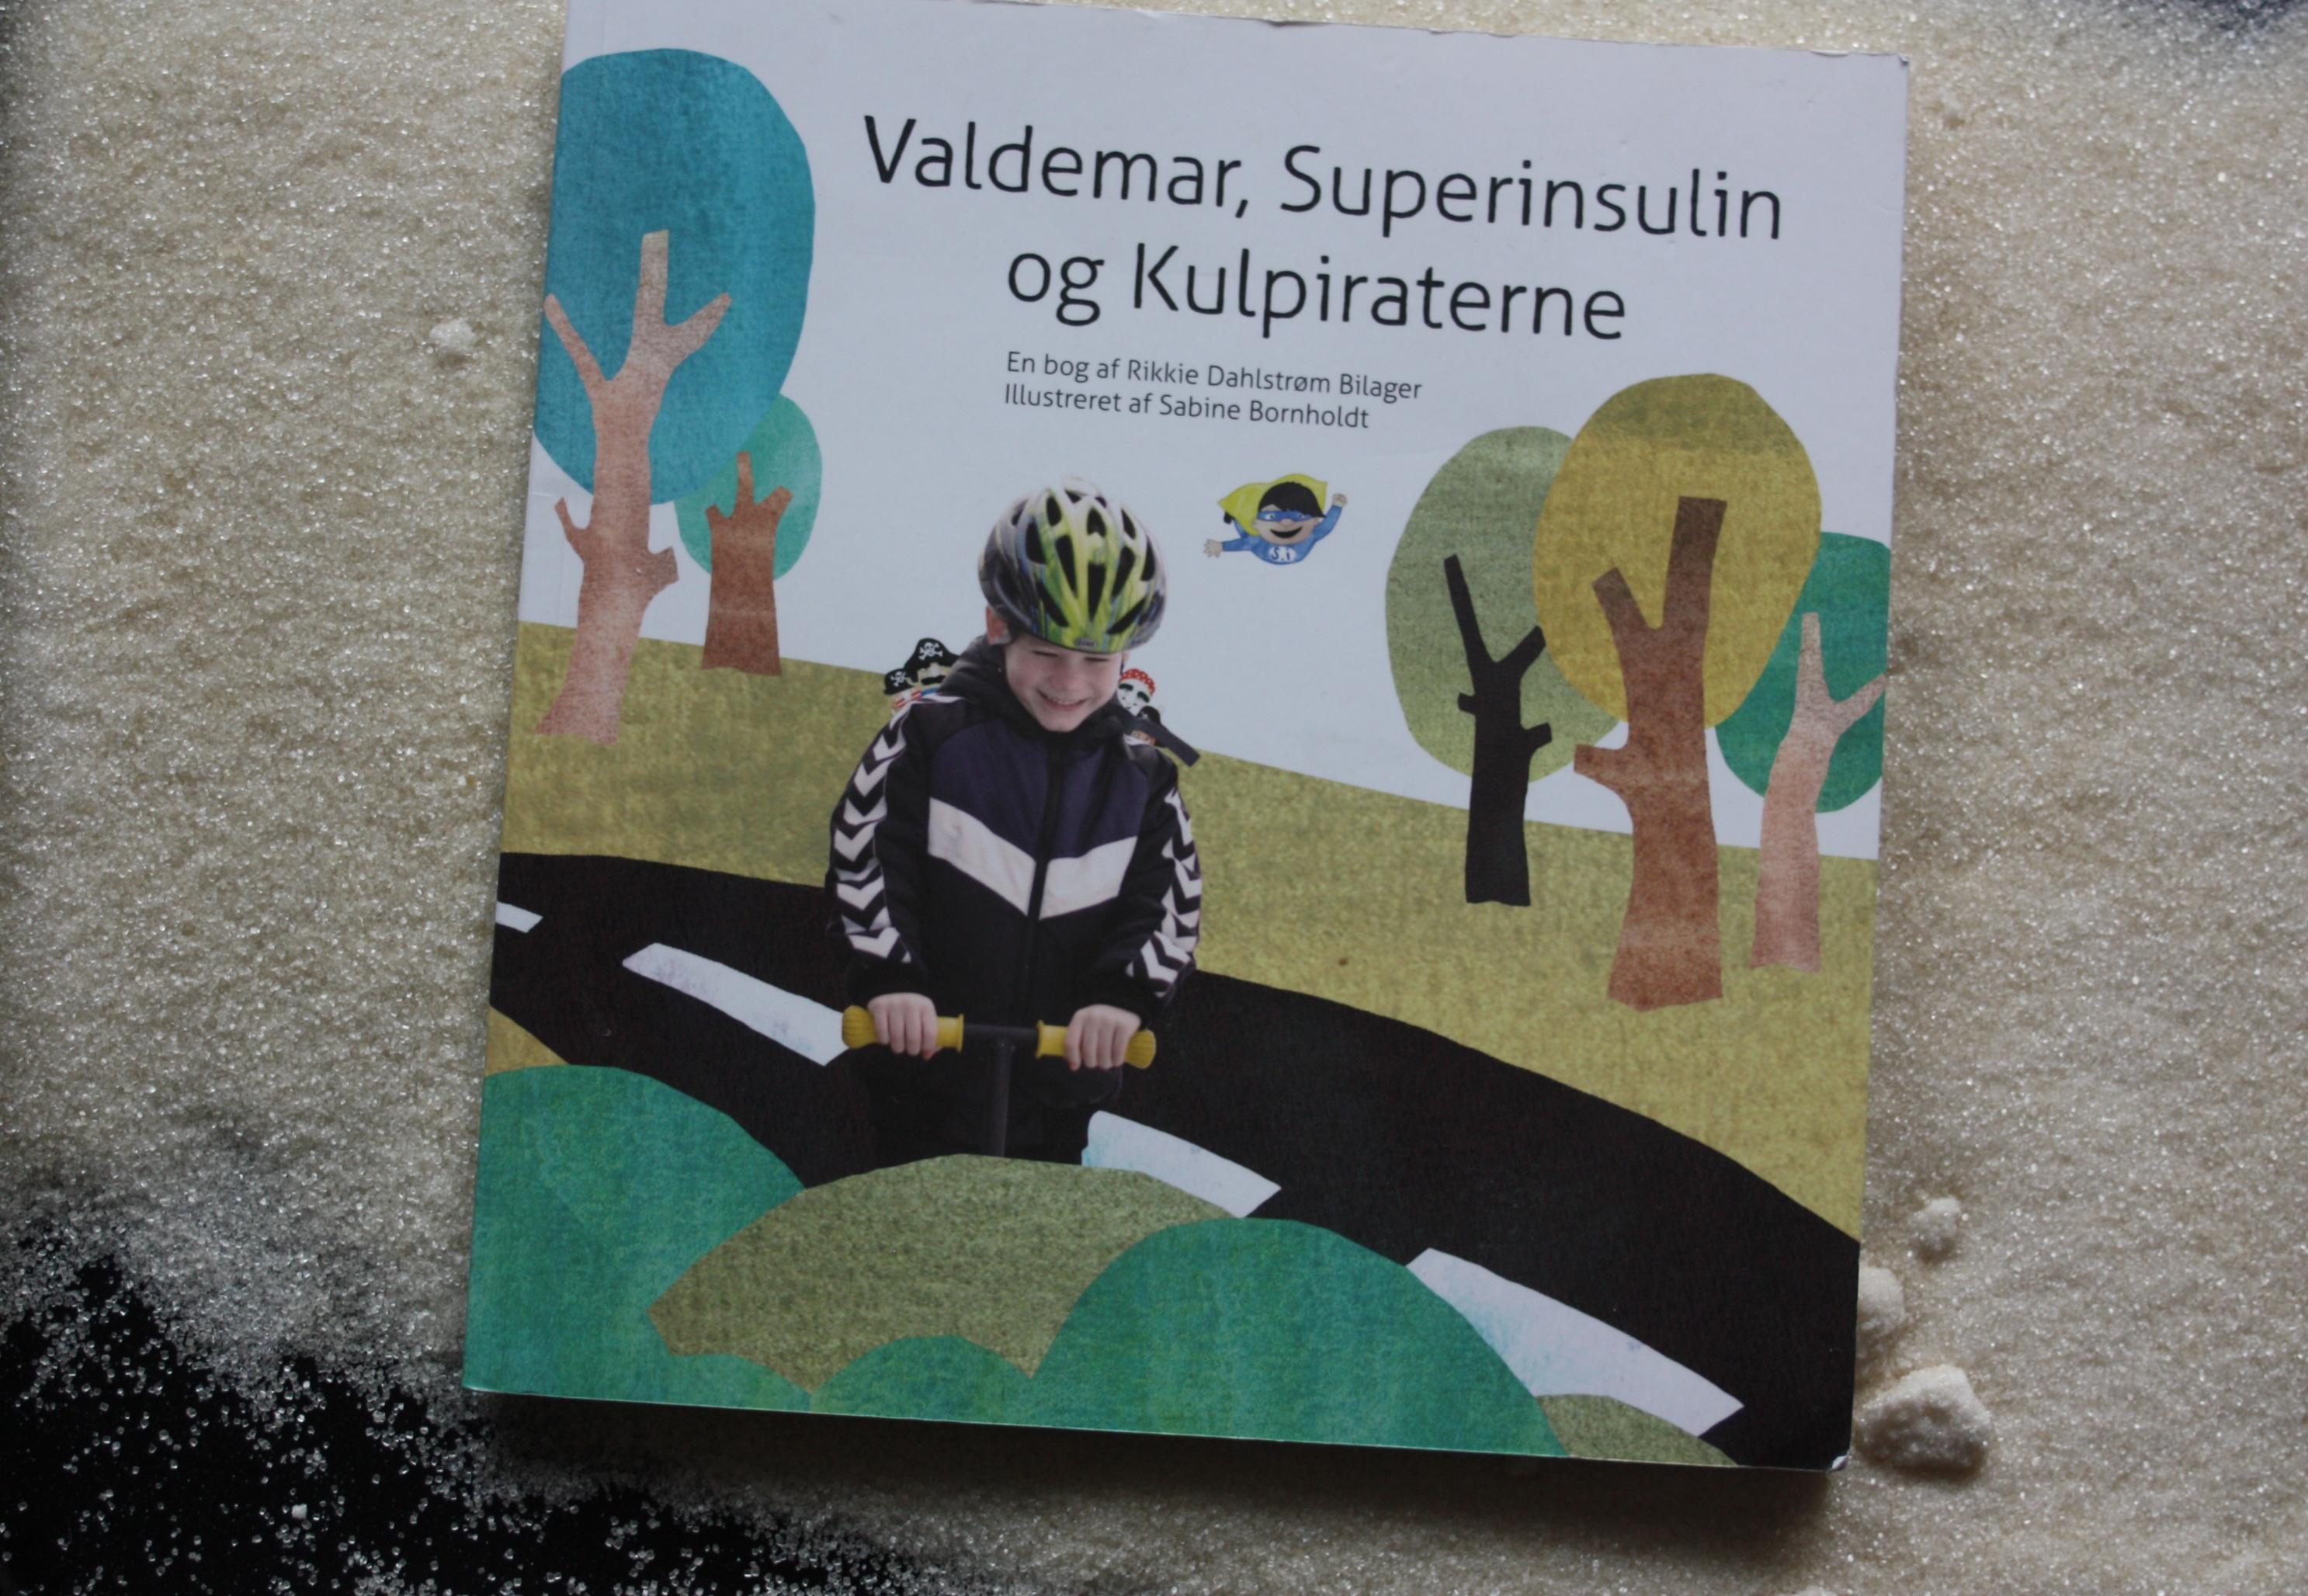 Valdemar, Superinsulin og Kulpiraterne